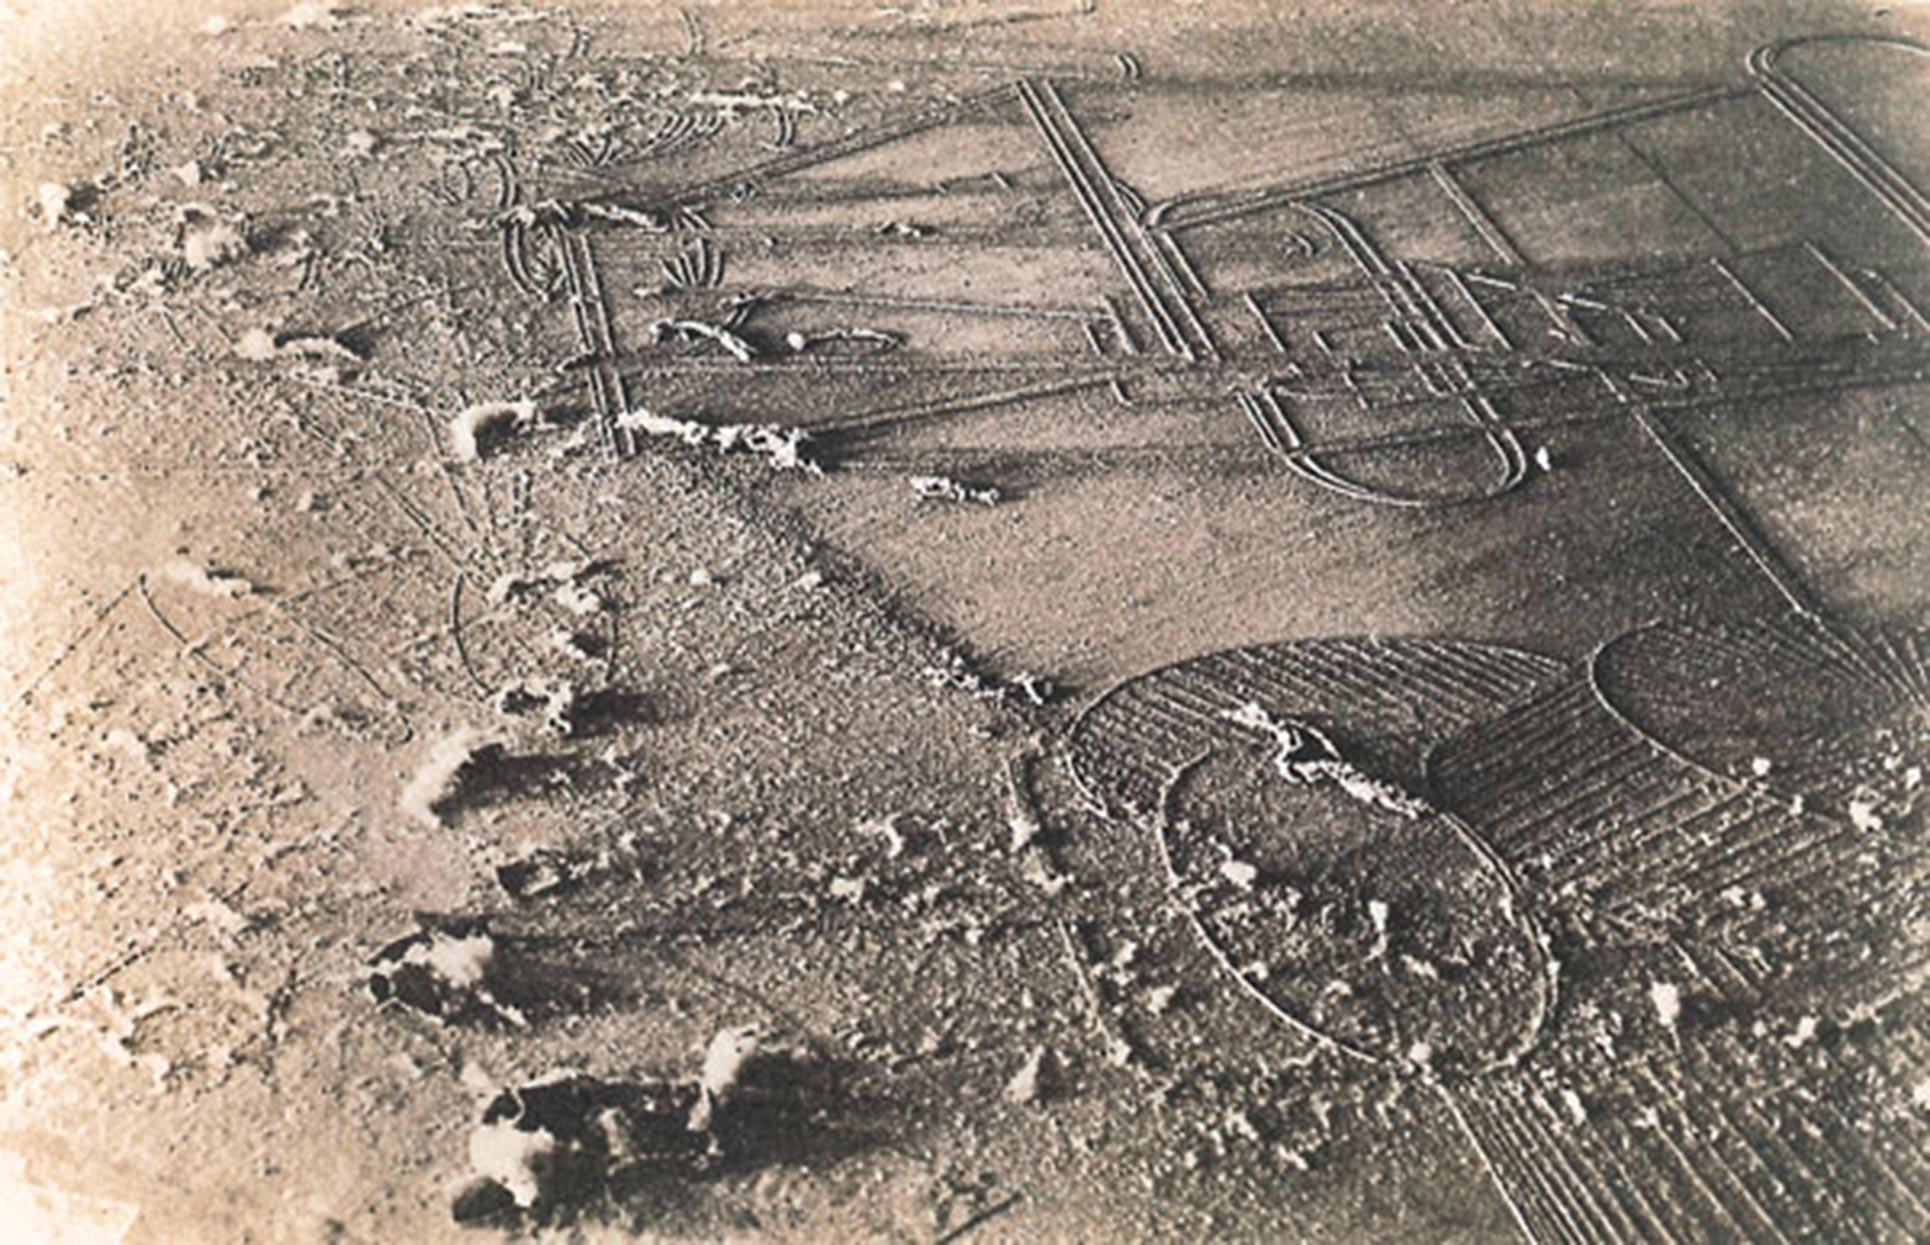 Man Ray, Marcel Duchamp, Dust Breeding II, 1920